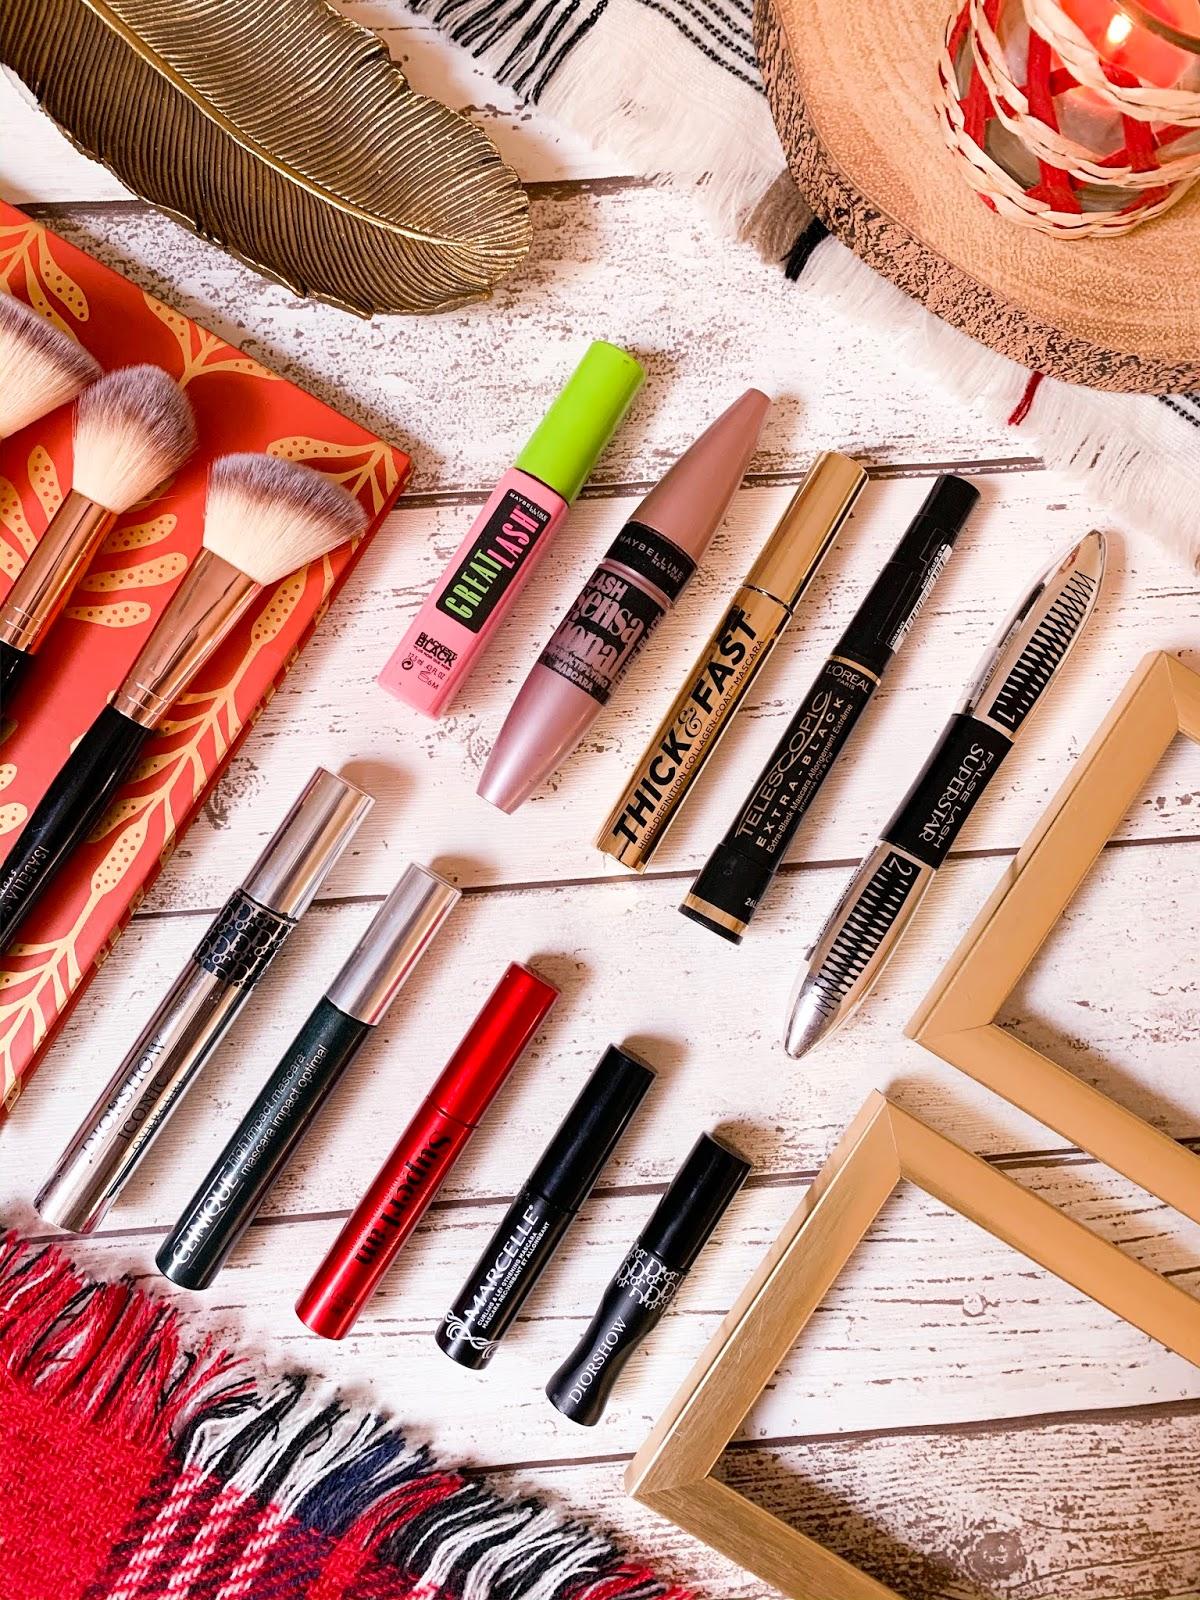 My Mascara Collection Flatlay